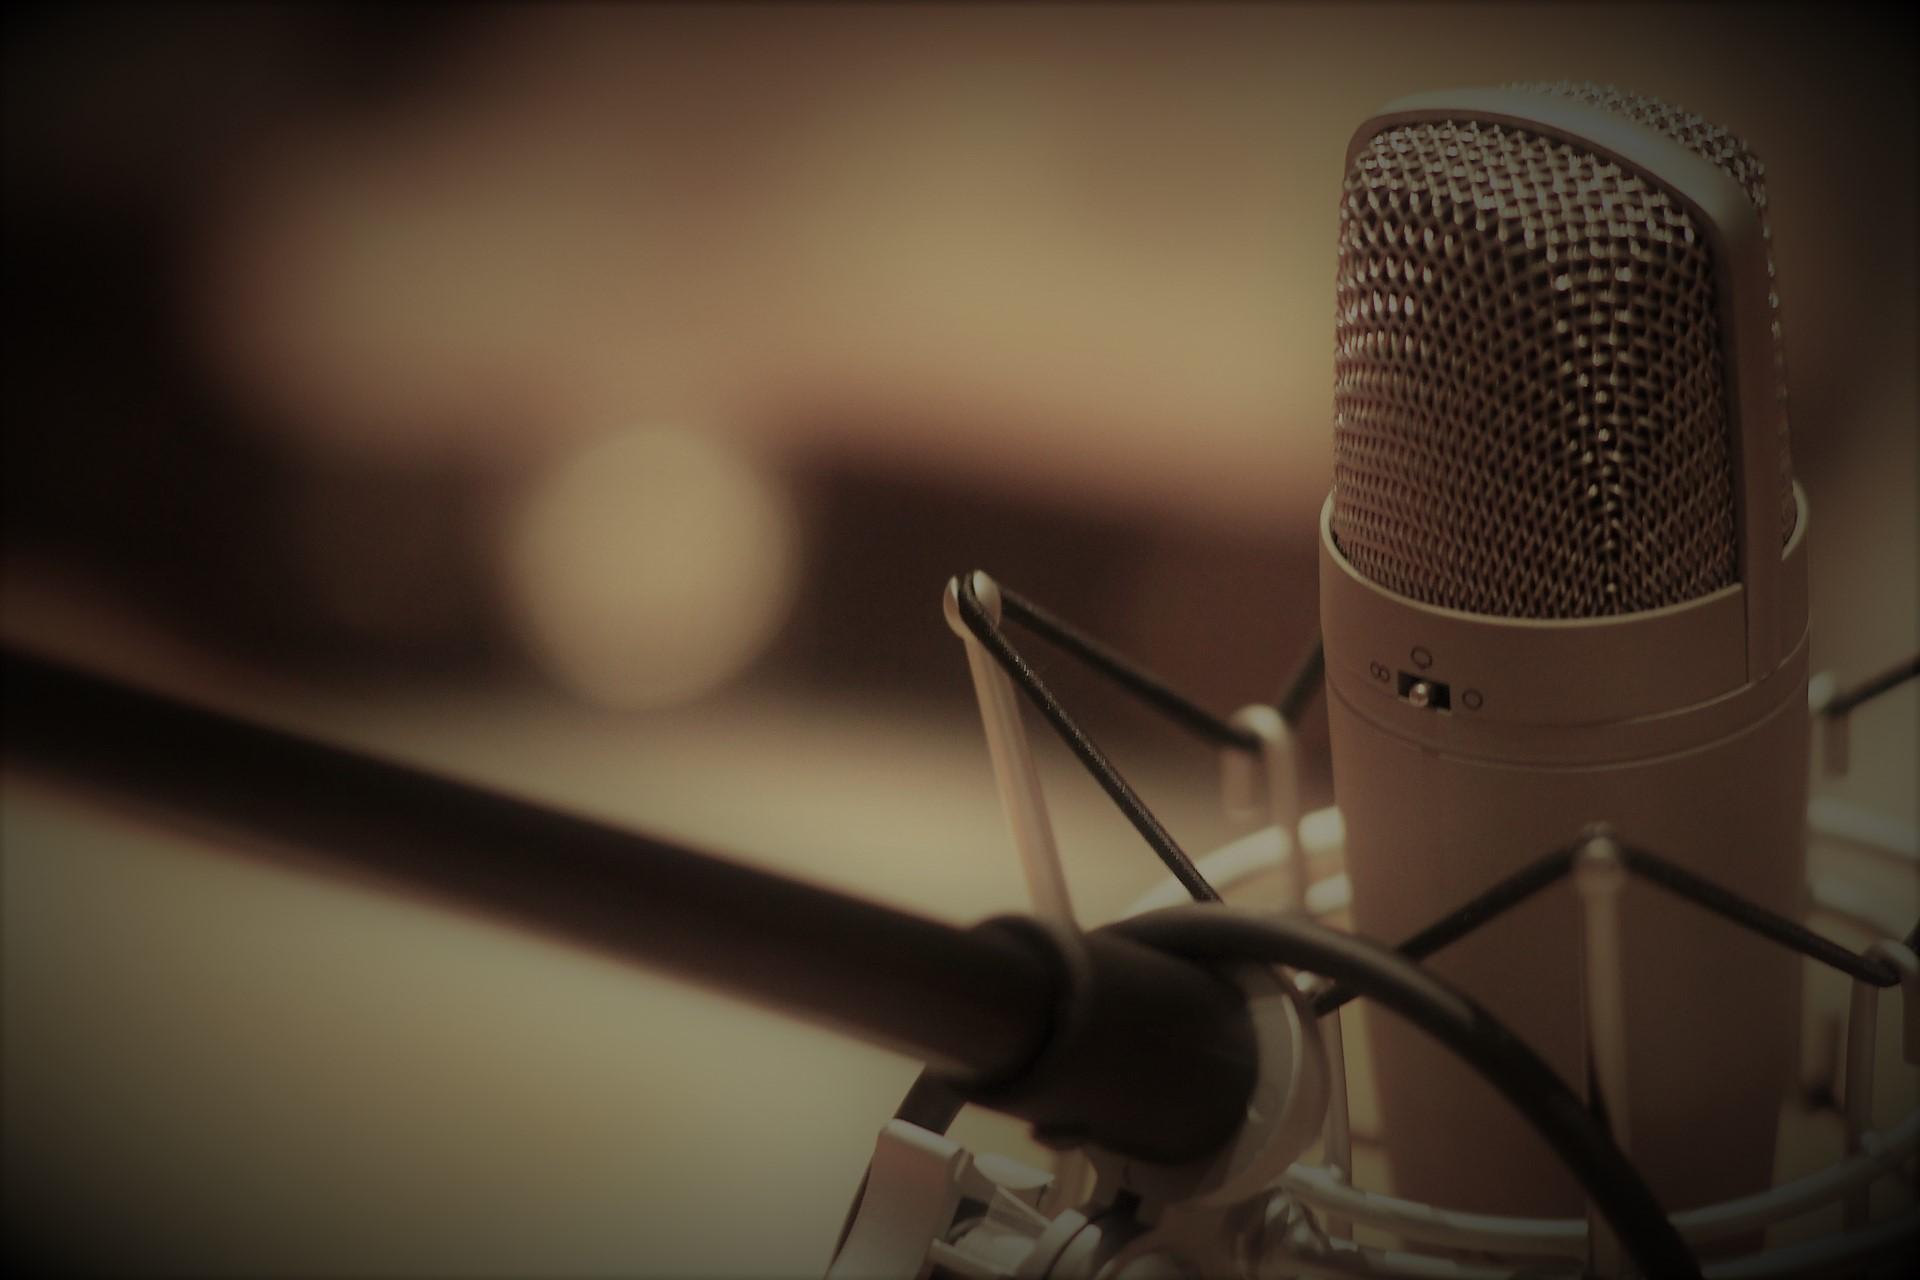 Spirit-Centered Business Podcast with Bralynn Newby